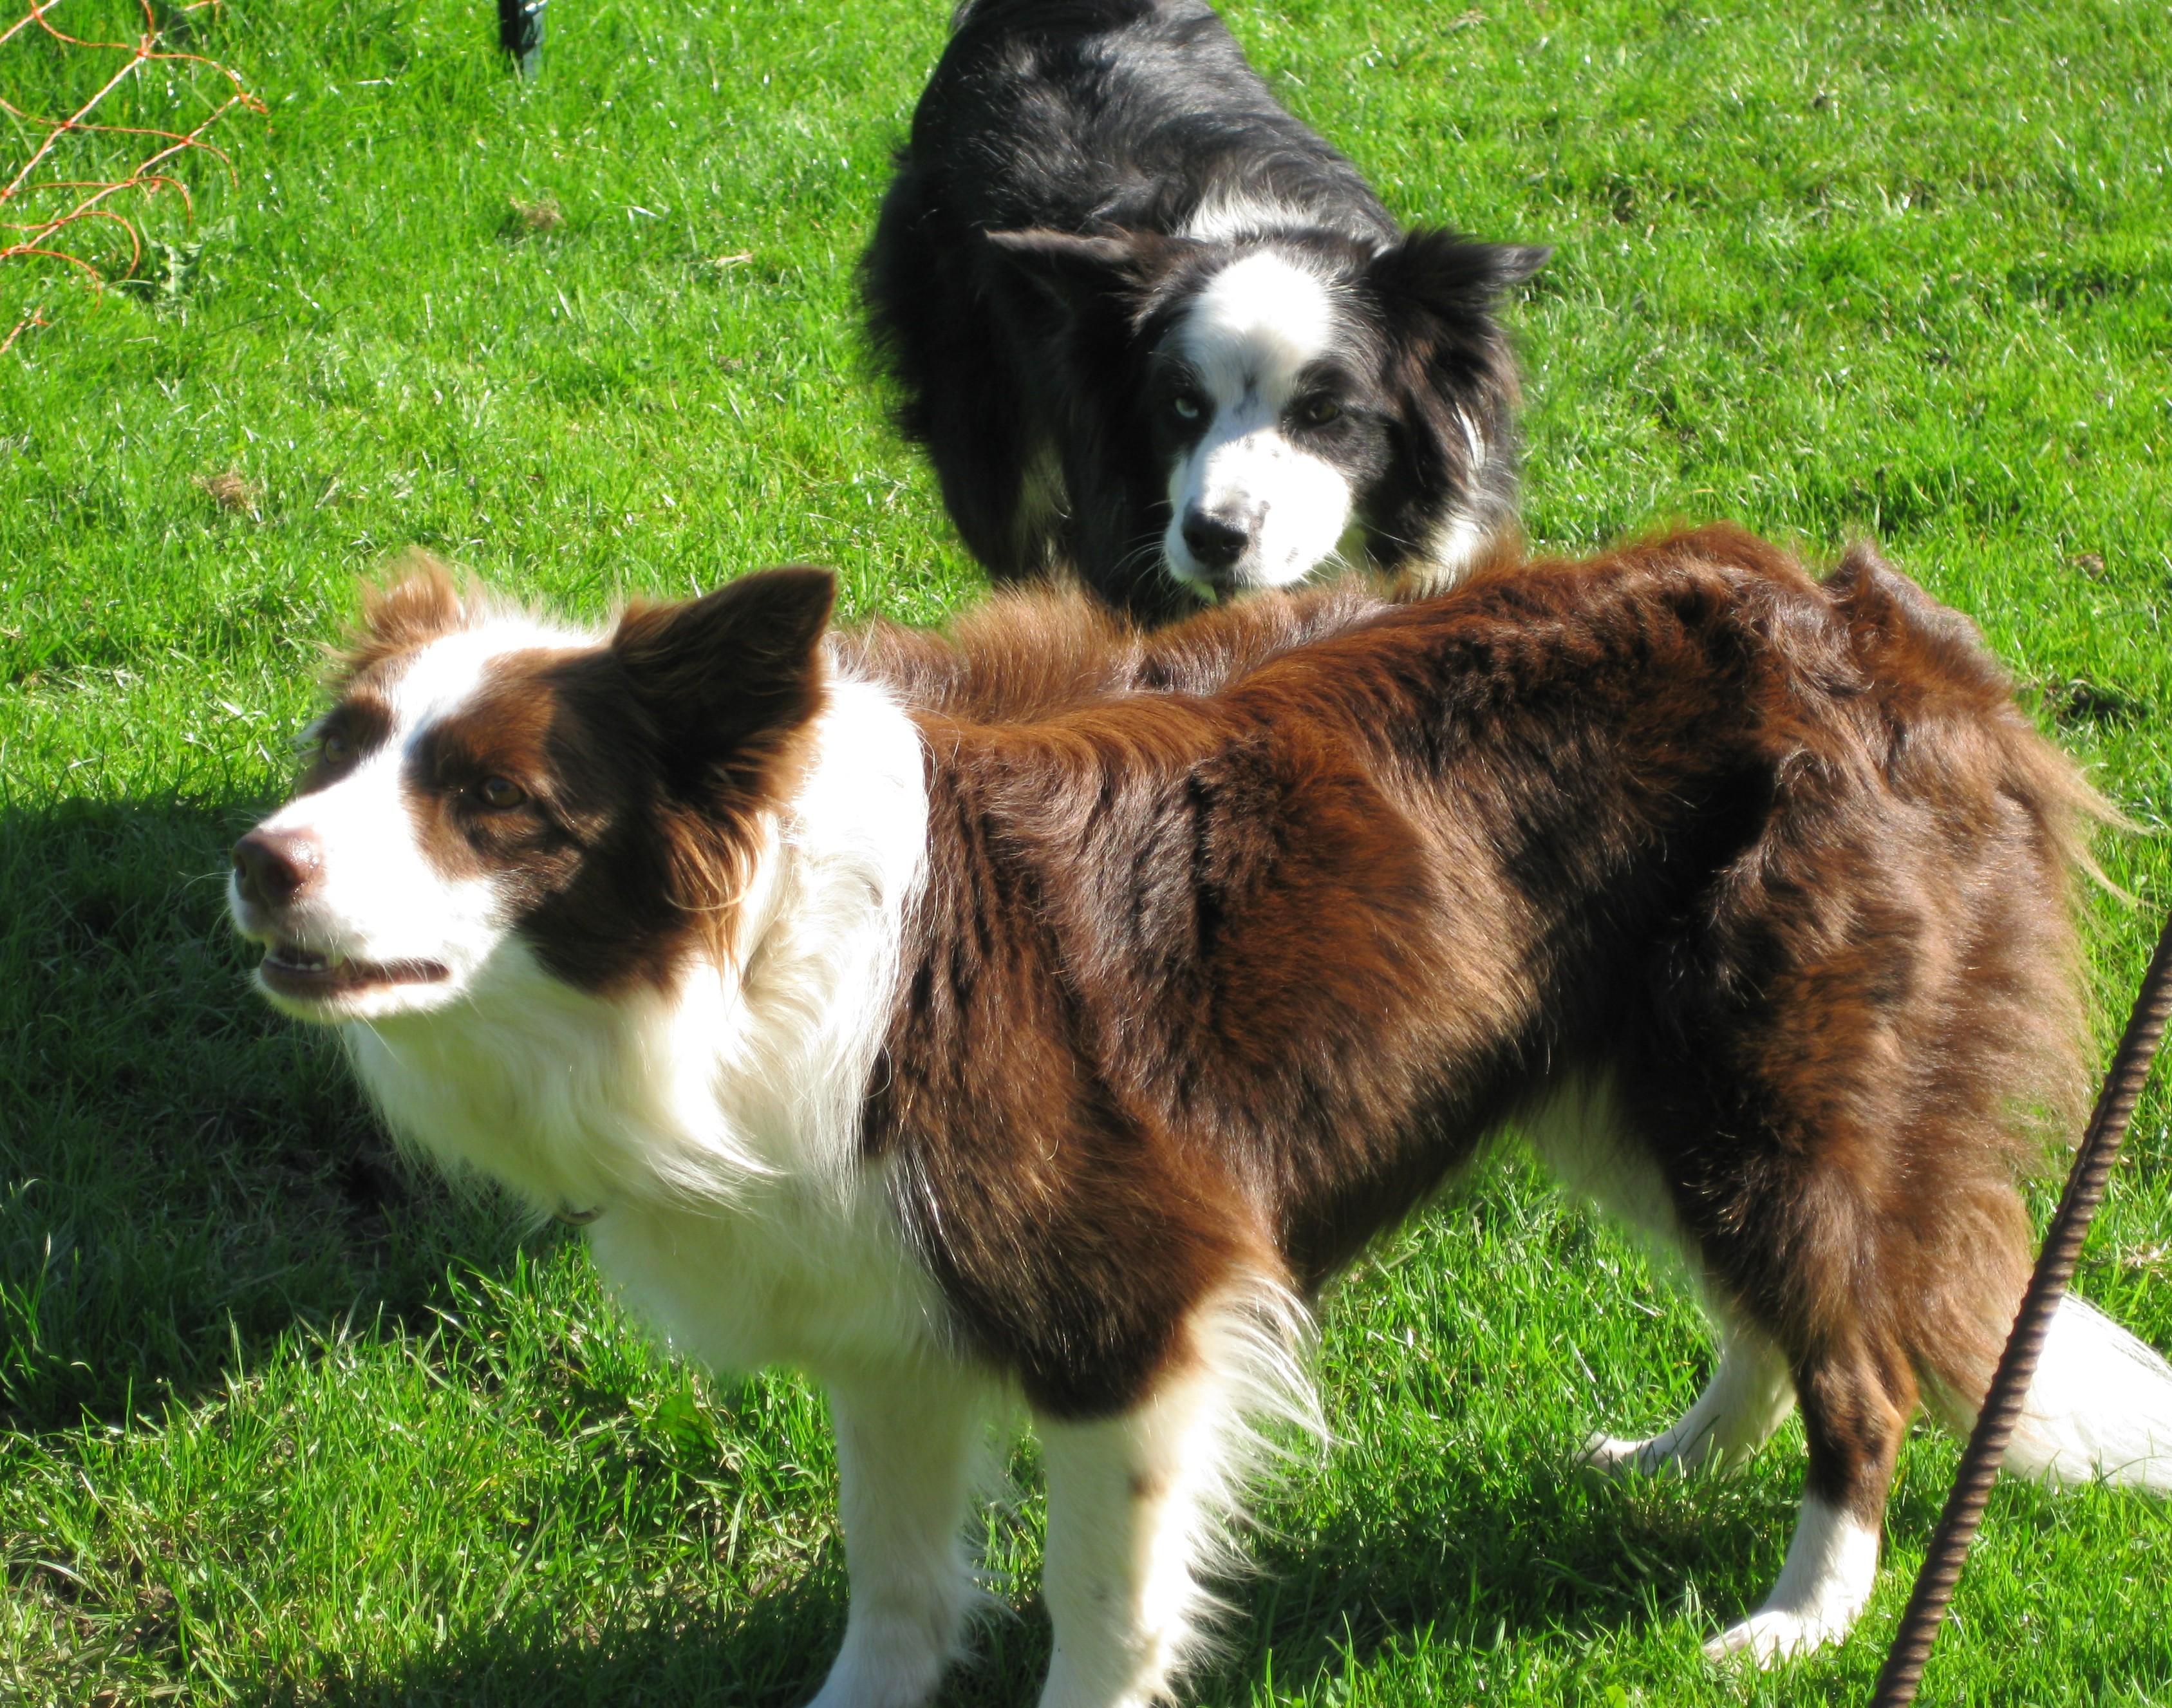 Leeloo & Macy